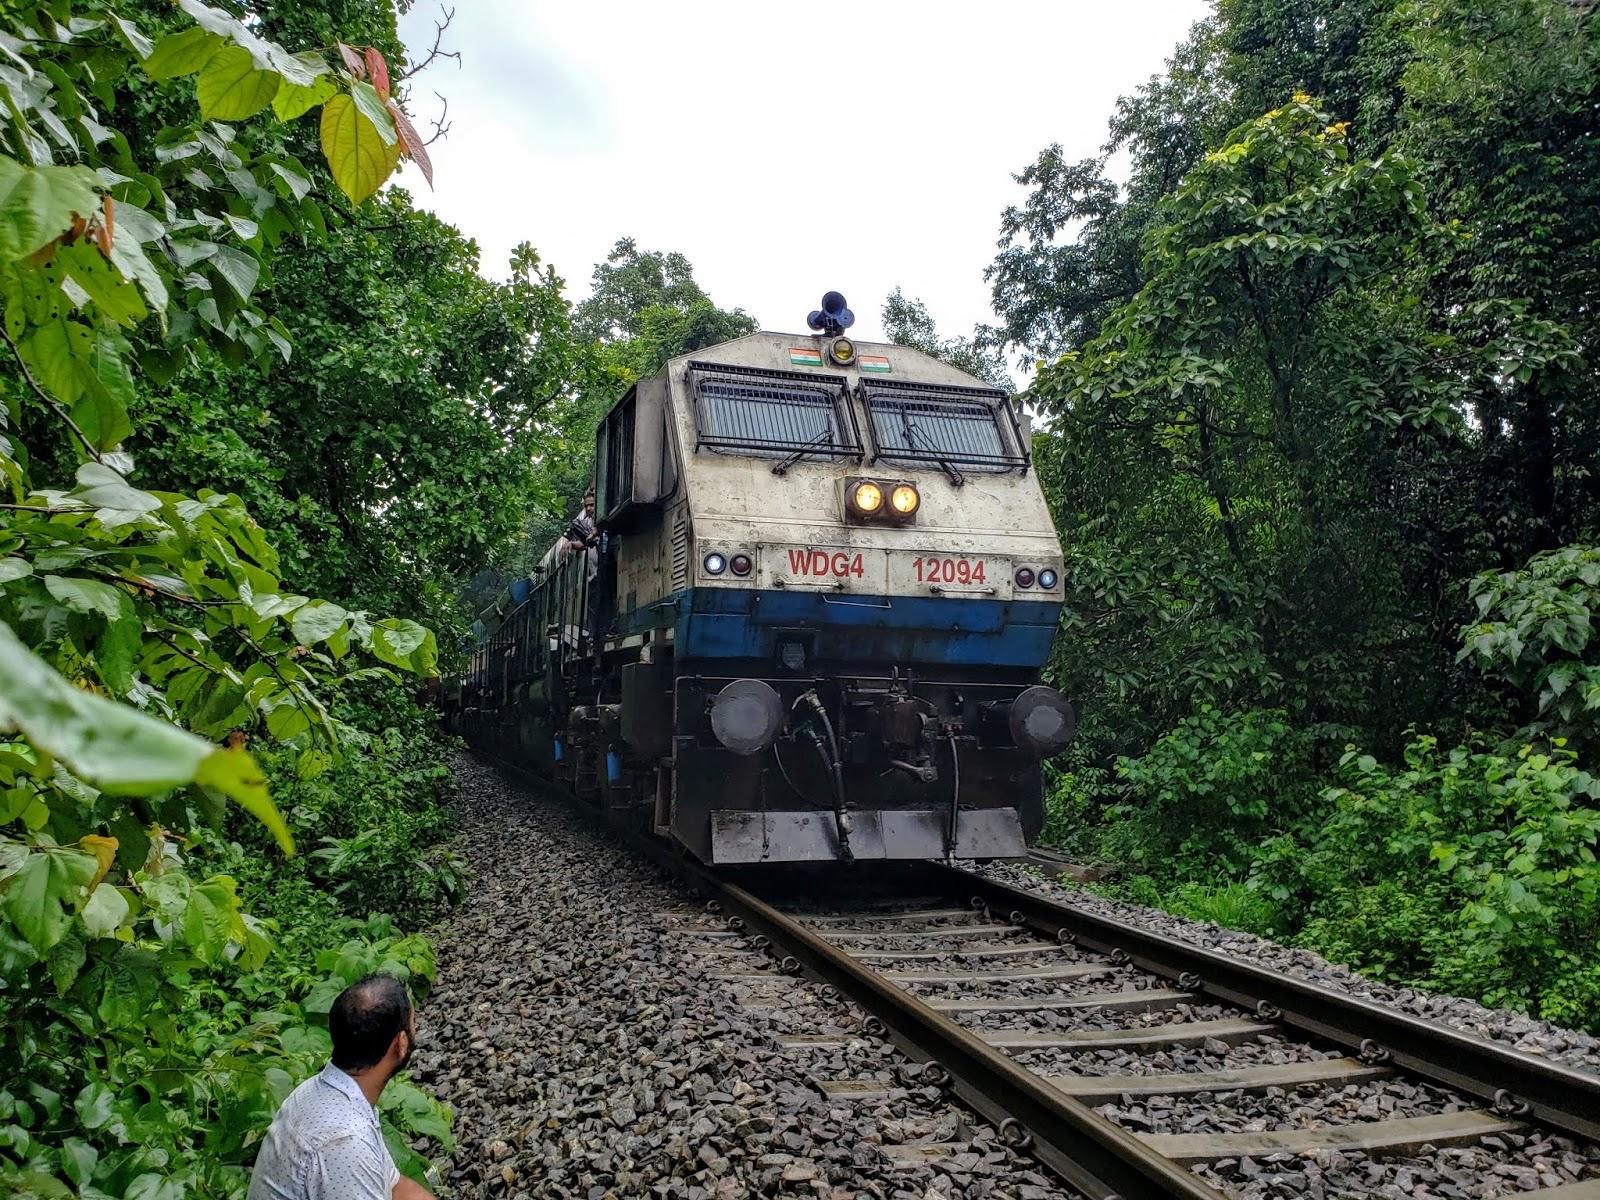 Freight train crossing on the Dudhsagar track